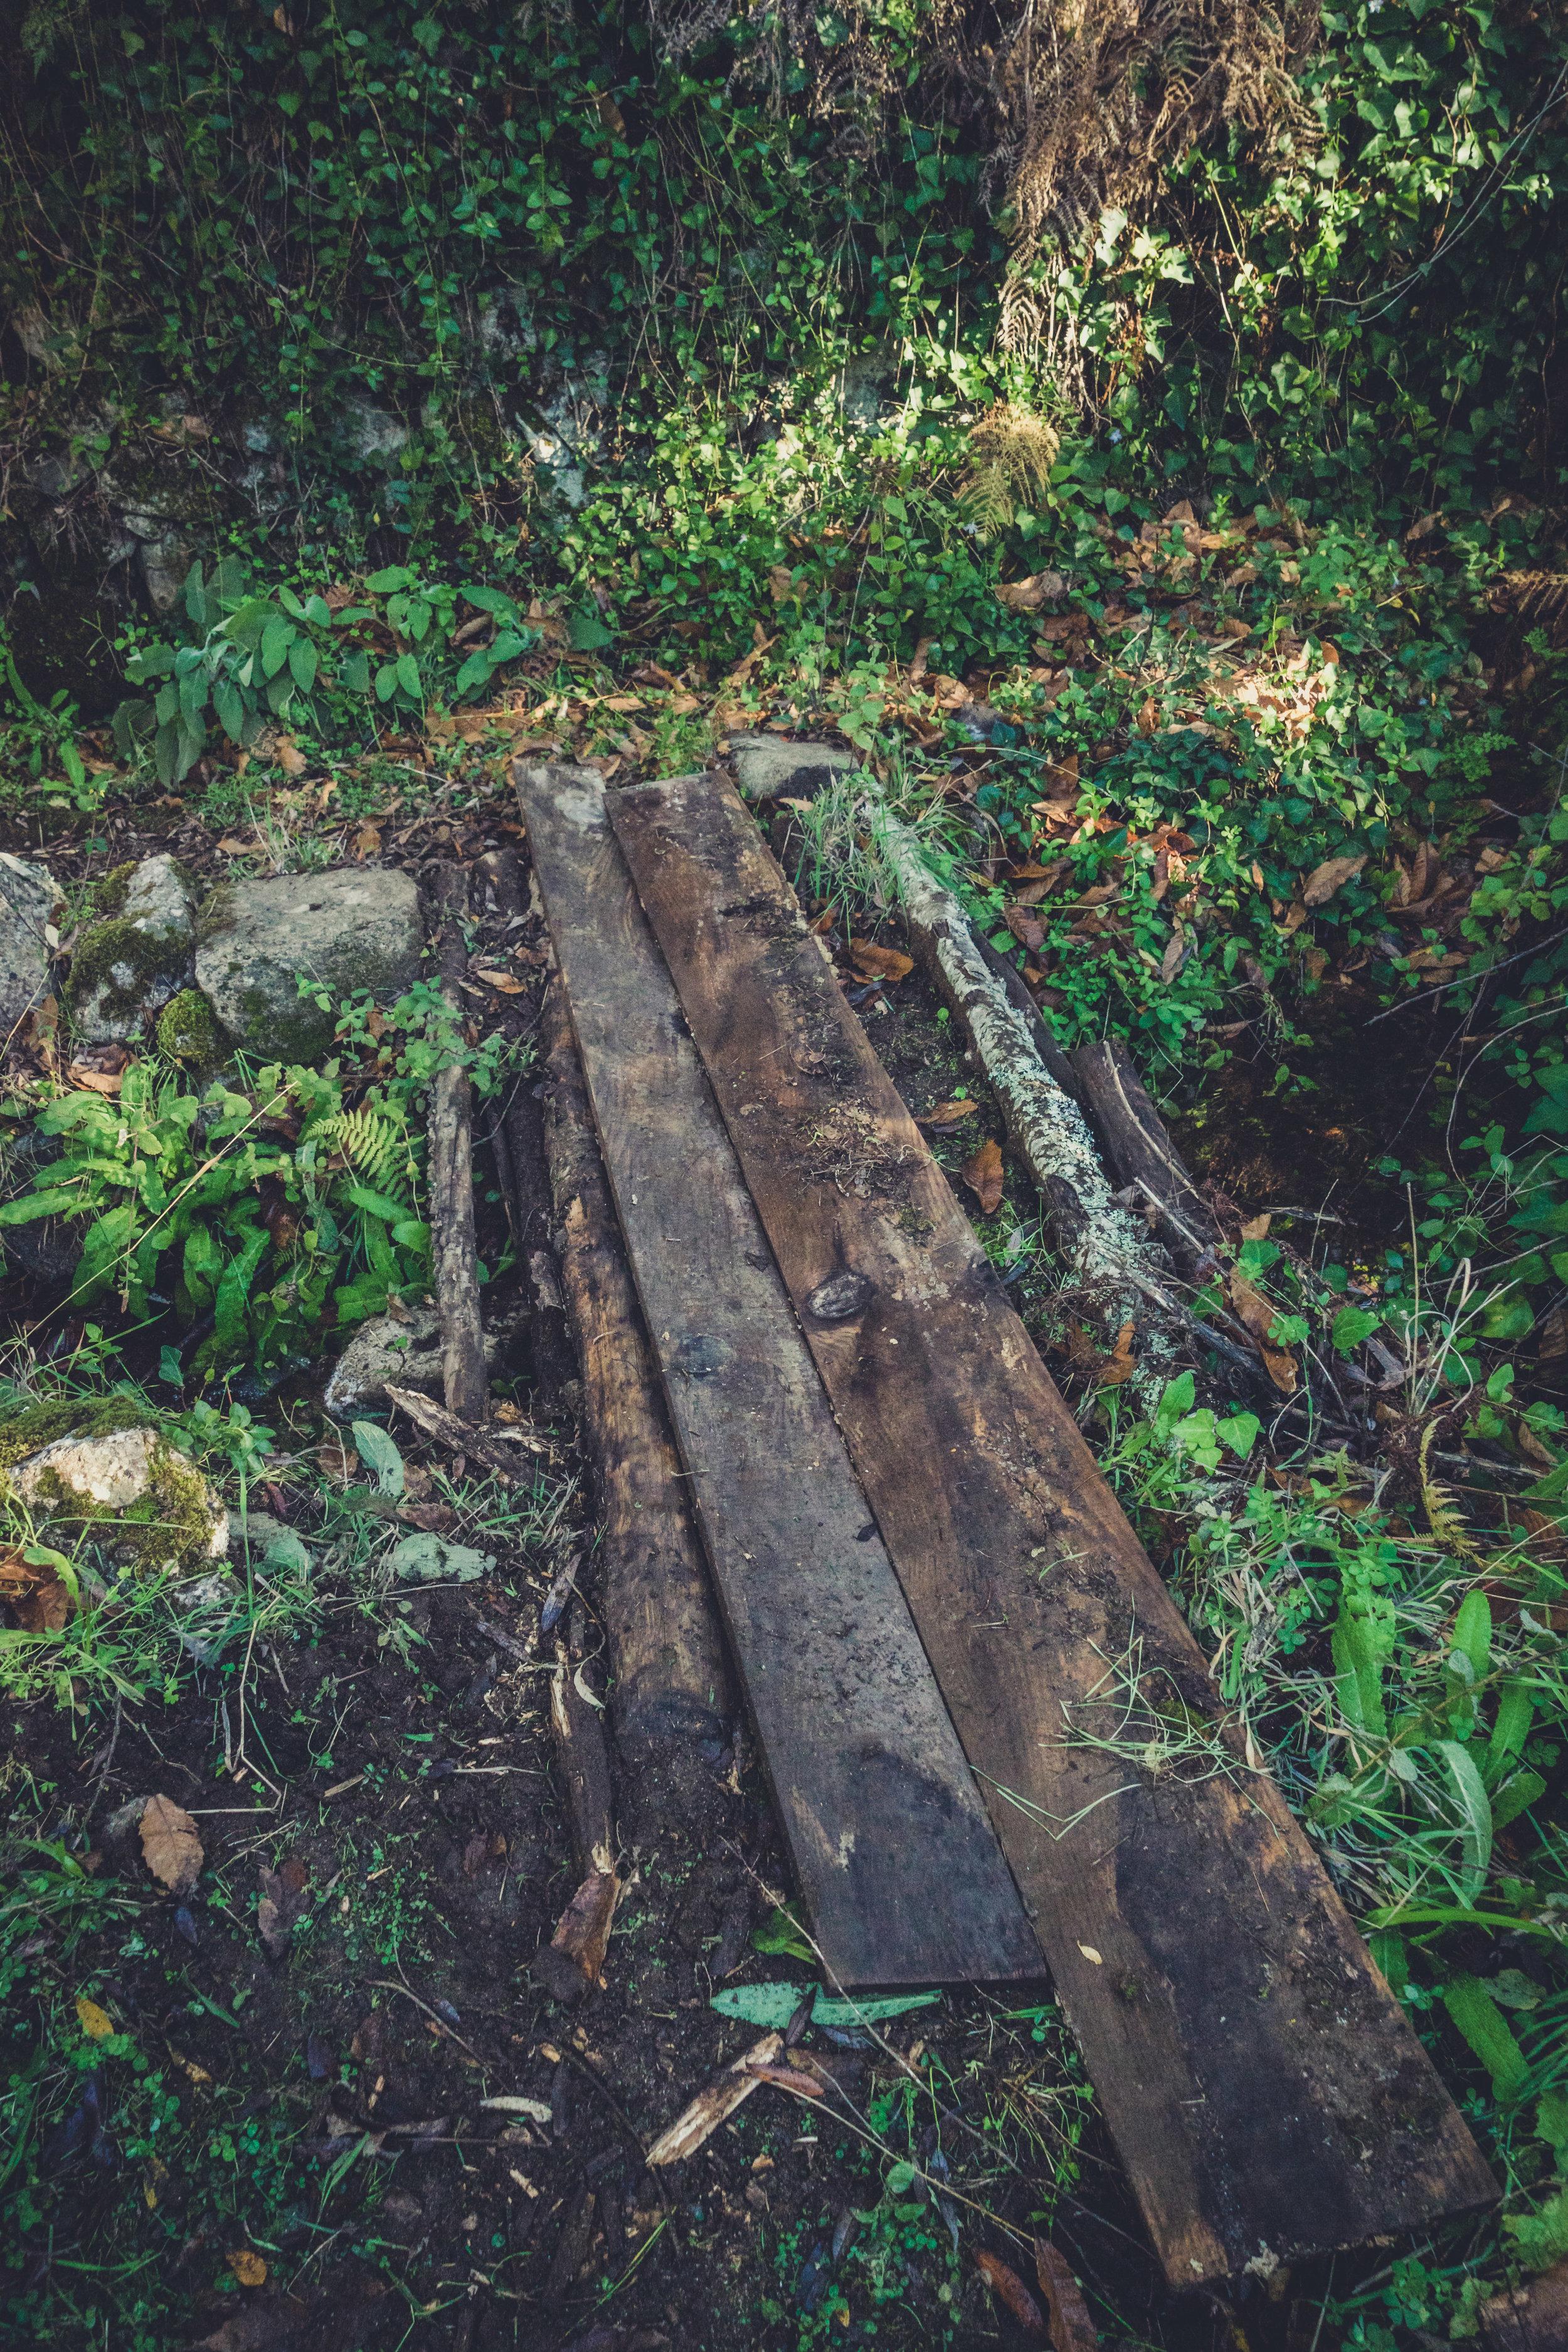 barbelote waterfall monchique portugal. hiking trail. walking trail. evil trees. lots of trees. cork trees. old bridge.jpg